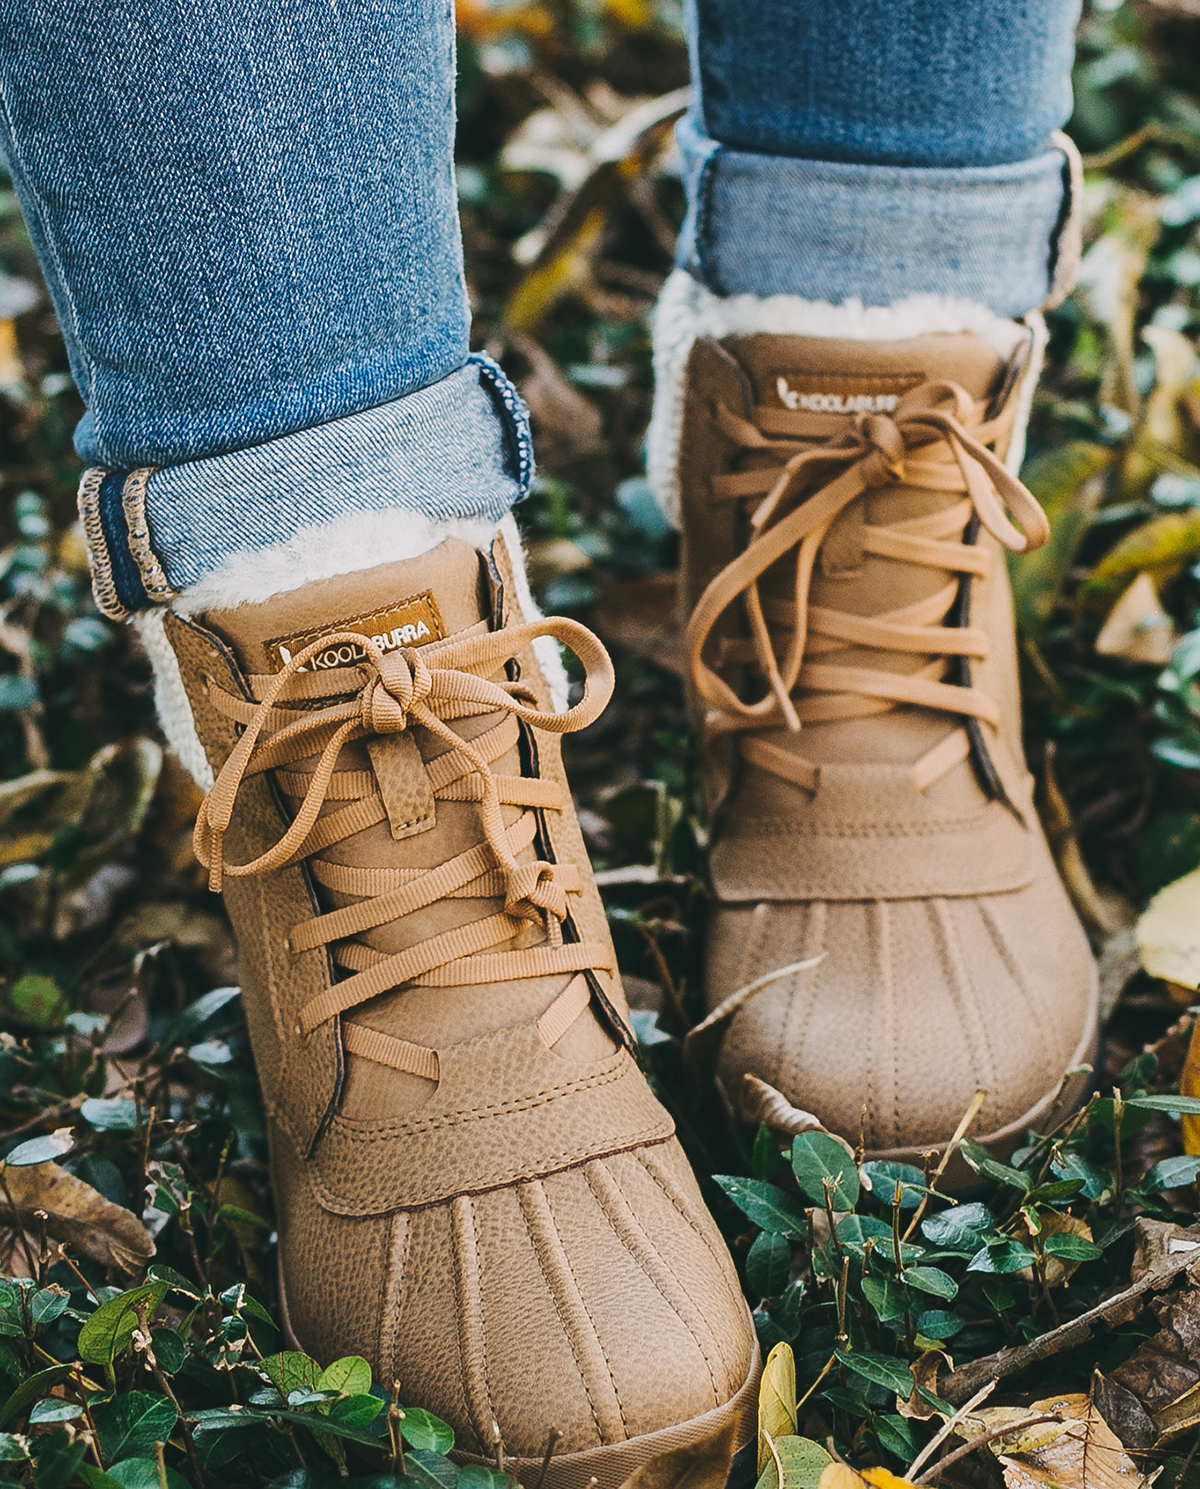 livvyland-blog-olivia-watson-ugg-koolabura-snow-shoes-warm-winter-boots-13